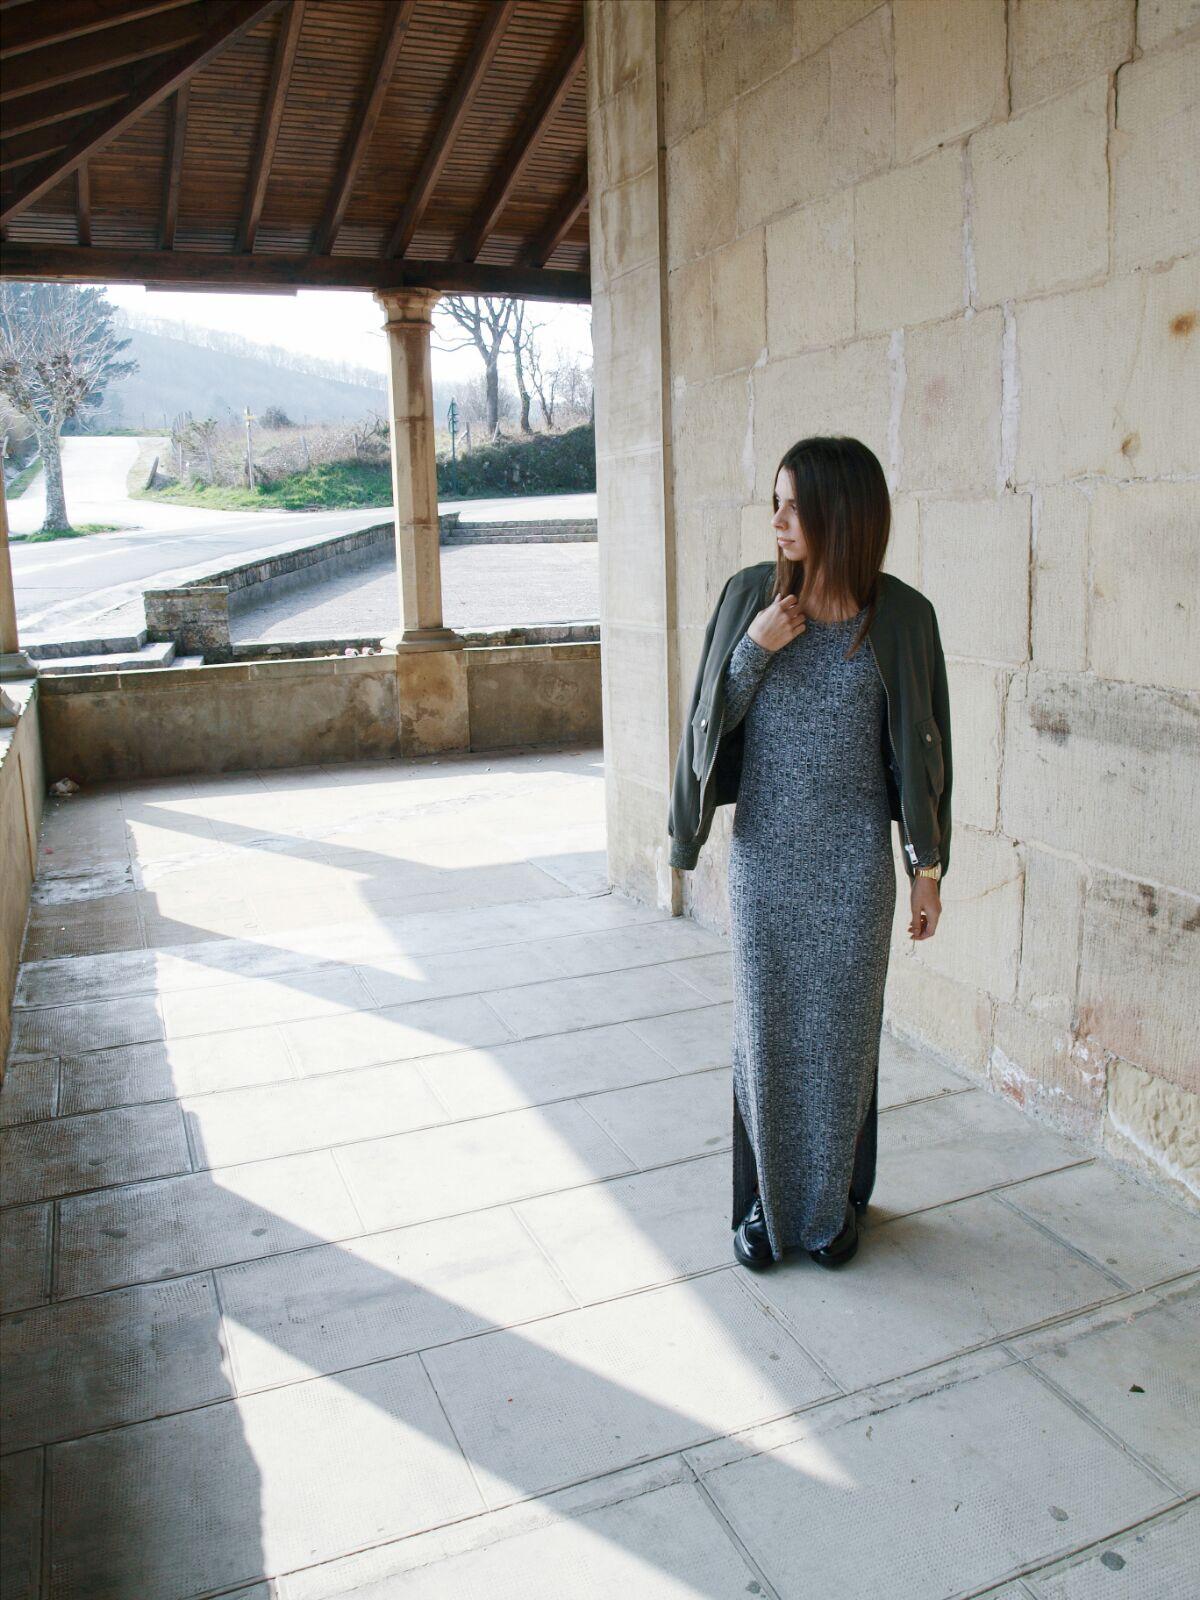 long-dress-canale-coastalandco-blog-blogger-hendaye-huadalupe-hondarribia-outfit-tenue-look-moda-mode-fashion